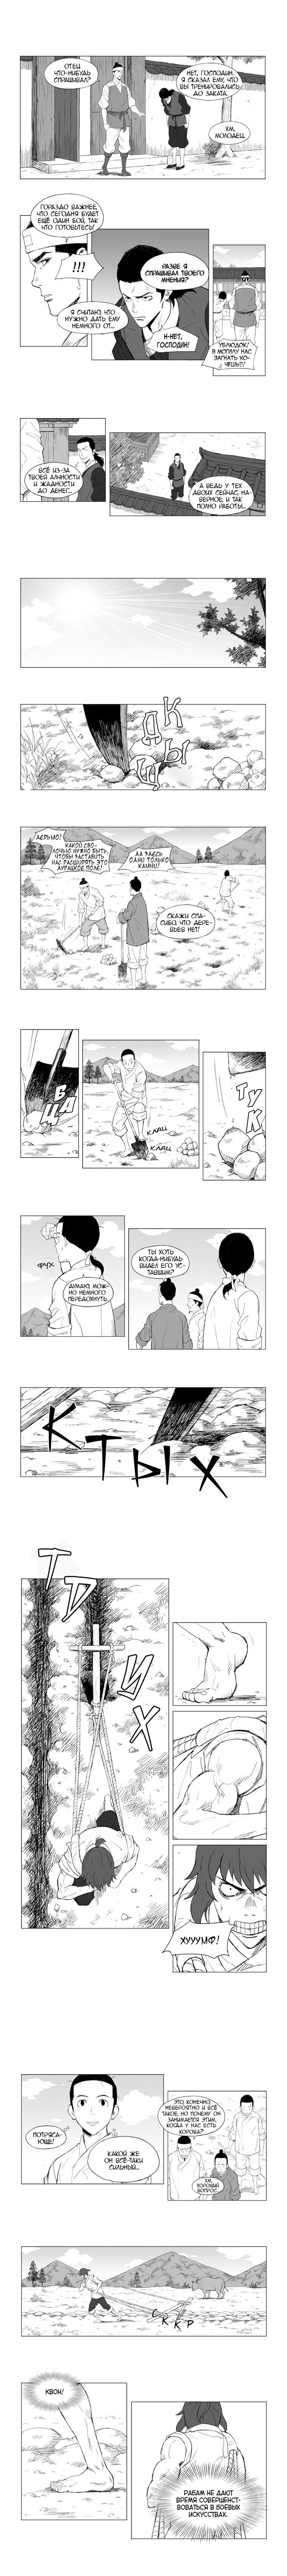 https://r1.ninemanga.com/comics/pic2/39/28263/285895/1456888231131.jpg Page 3